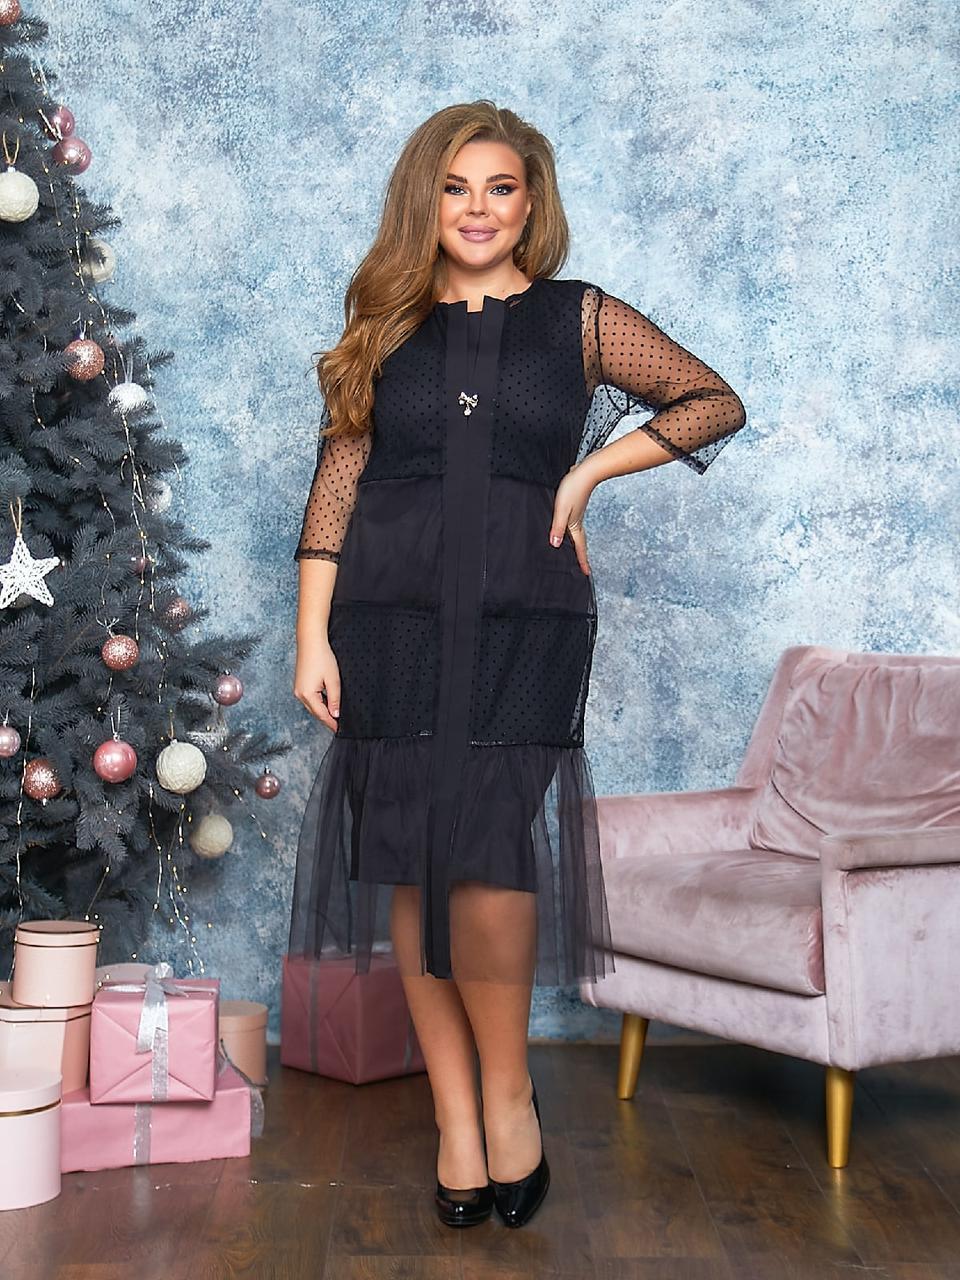 Элегантное платье-карандаш с кардиганом накидкой из сетки, батал большие размеры